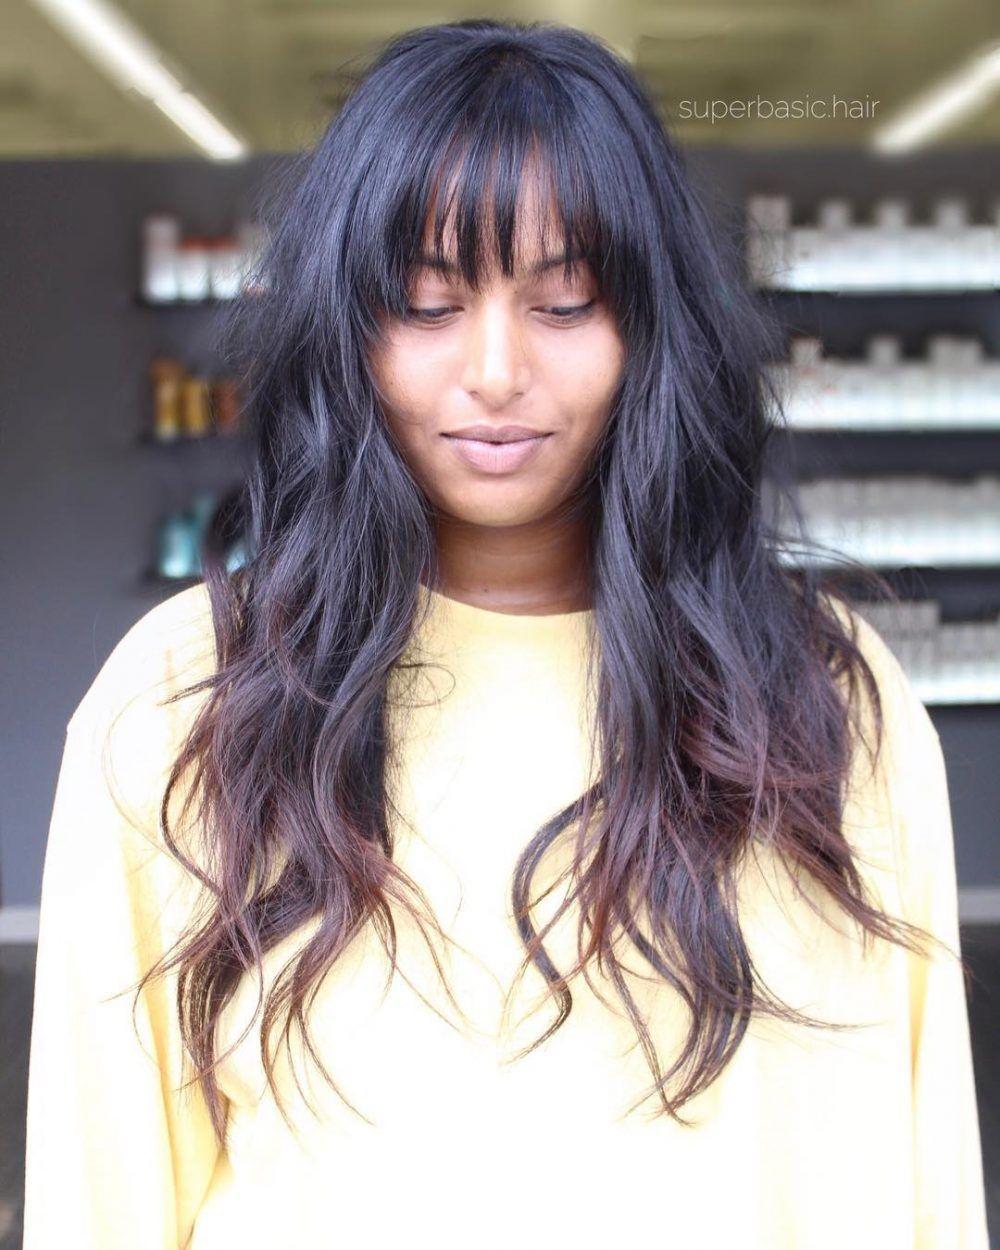 Long Shag Haircuts 30 Easy Examples For 2020 Long Shag